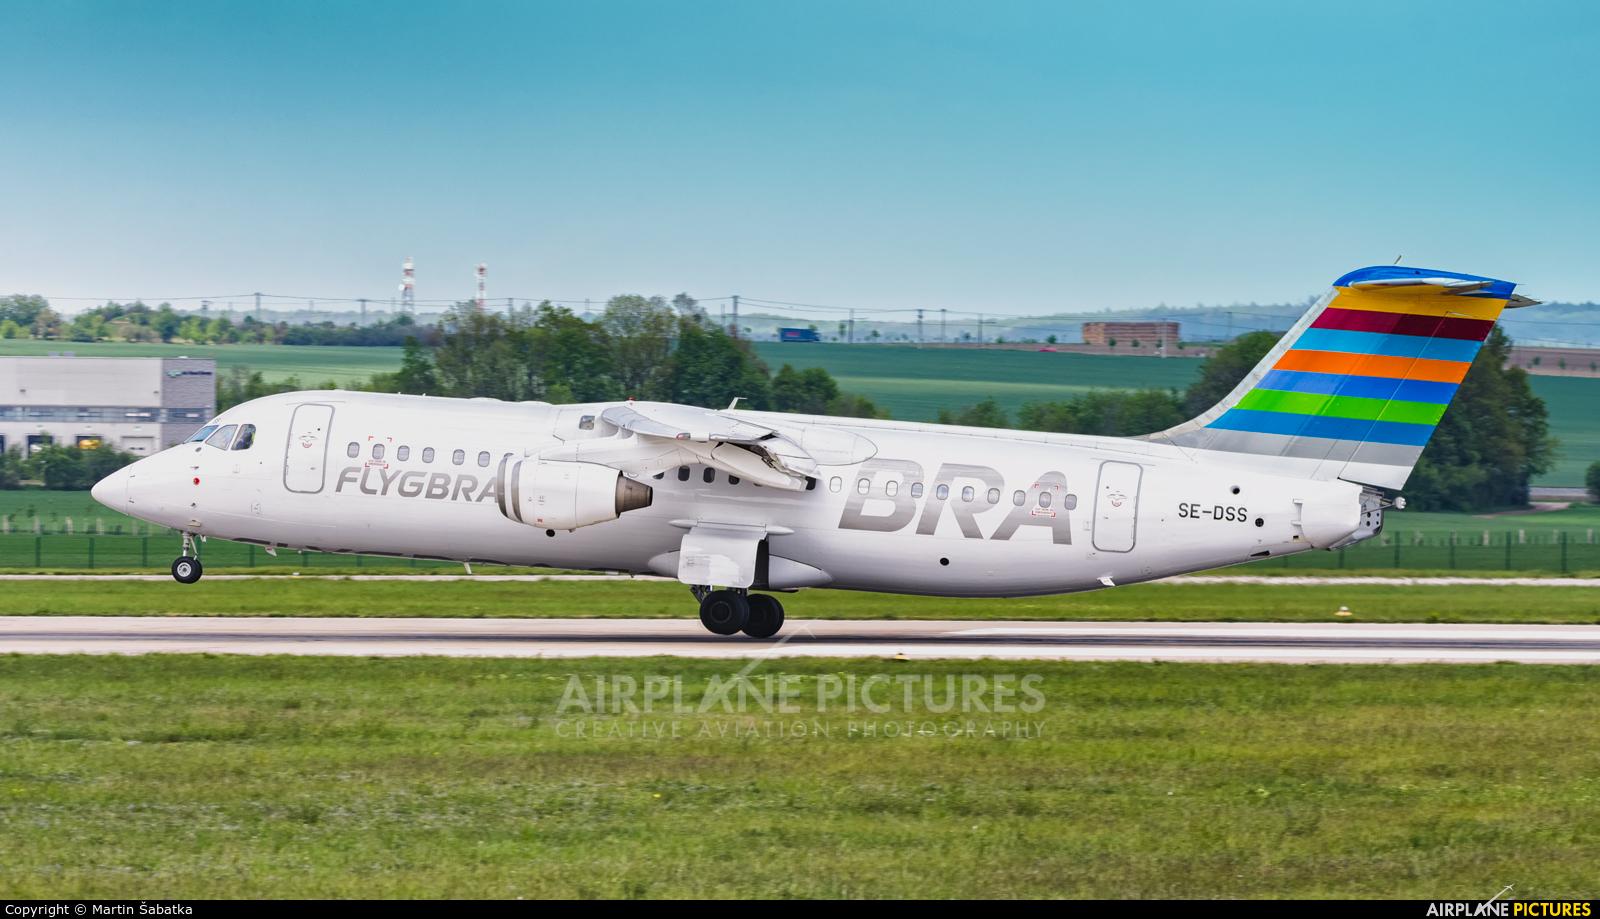 BRA (Sweden) SE-DSS aircraft at Brno - Tuřany